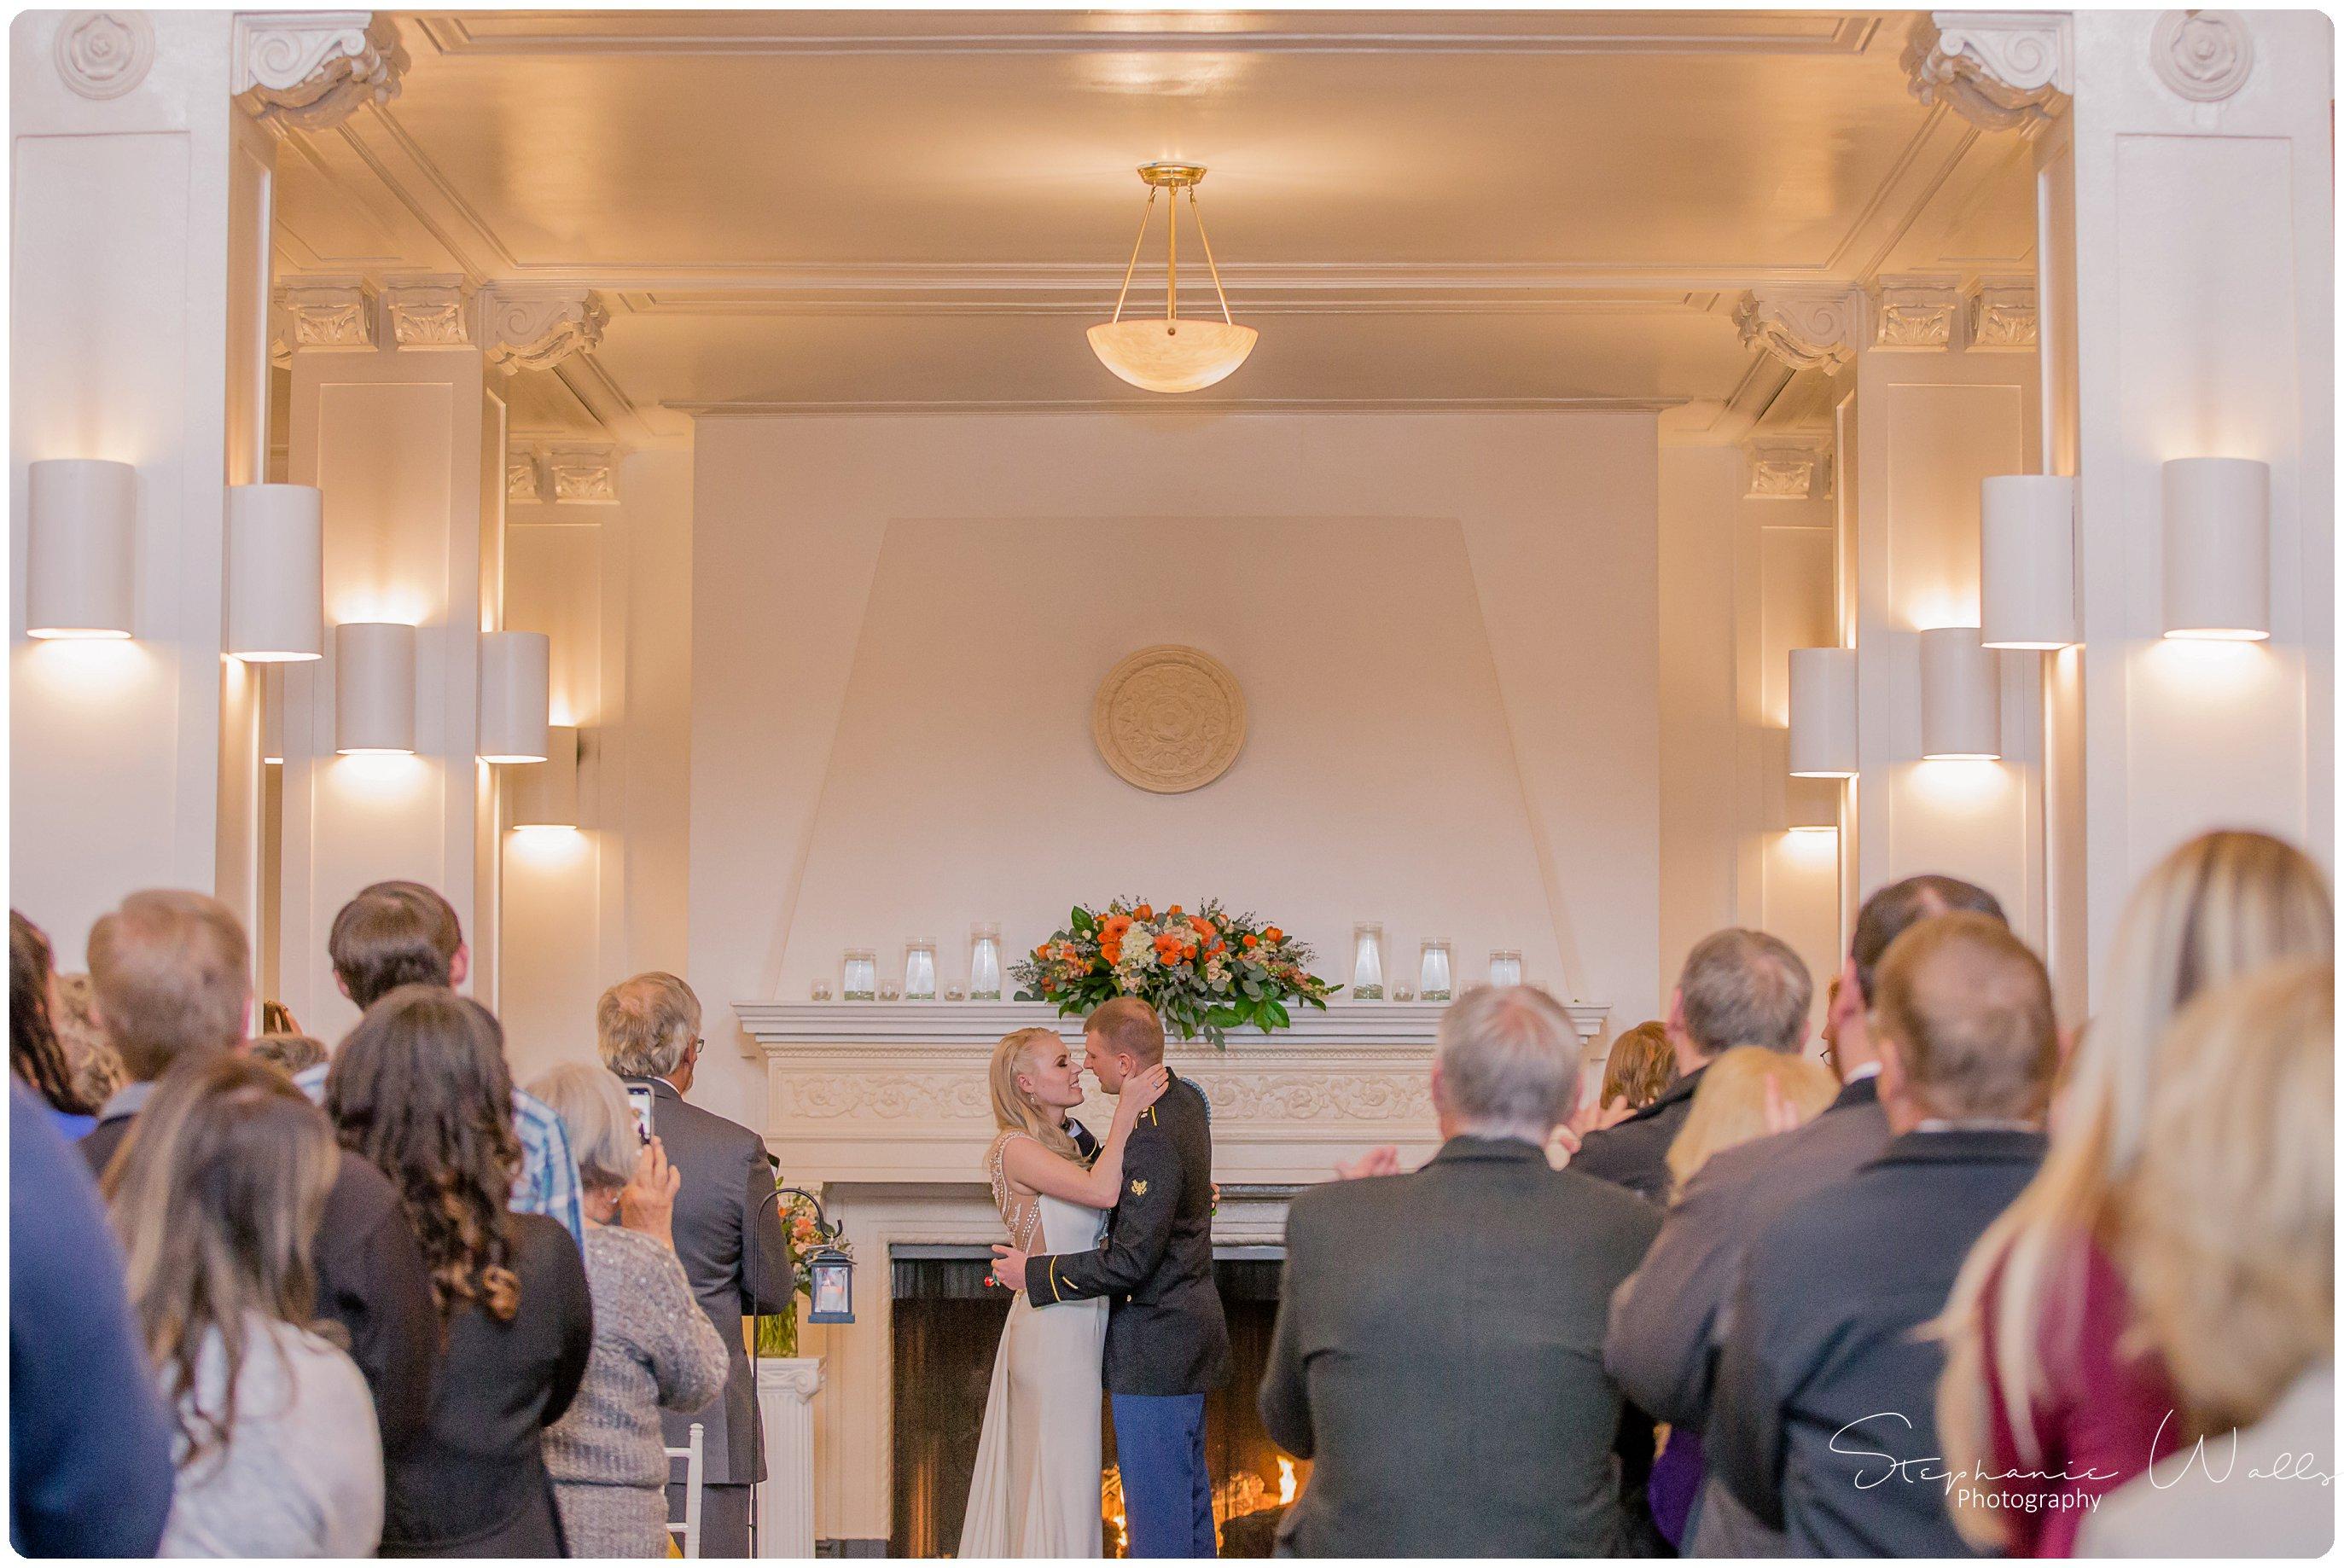 Sears Ceremony 195 The Hero & The Starlet | Monte Cristo Ballroom | Stephanie Walls Photography Weddings